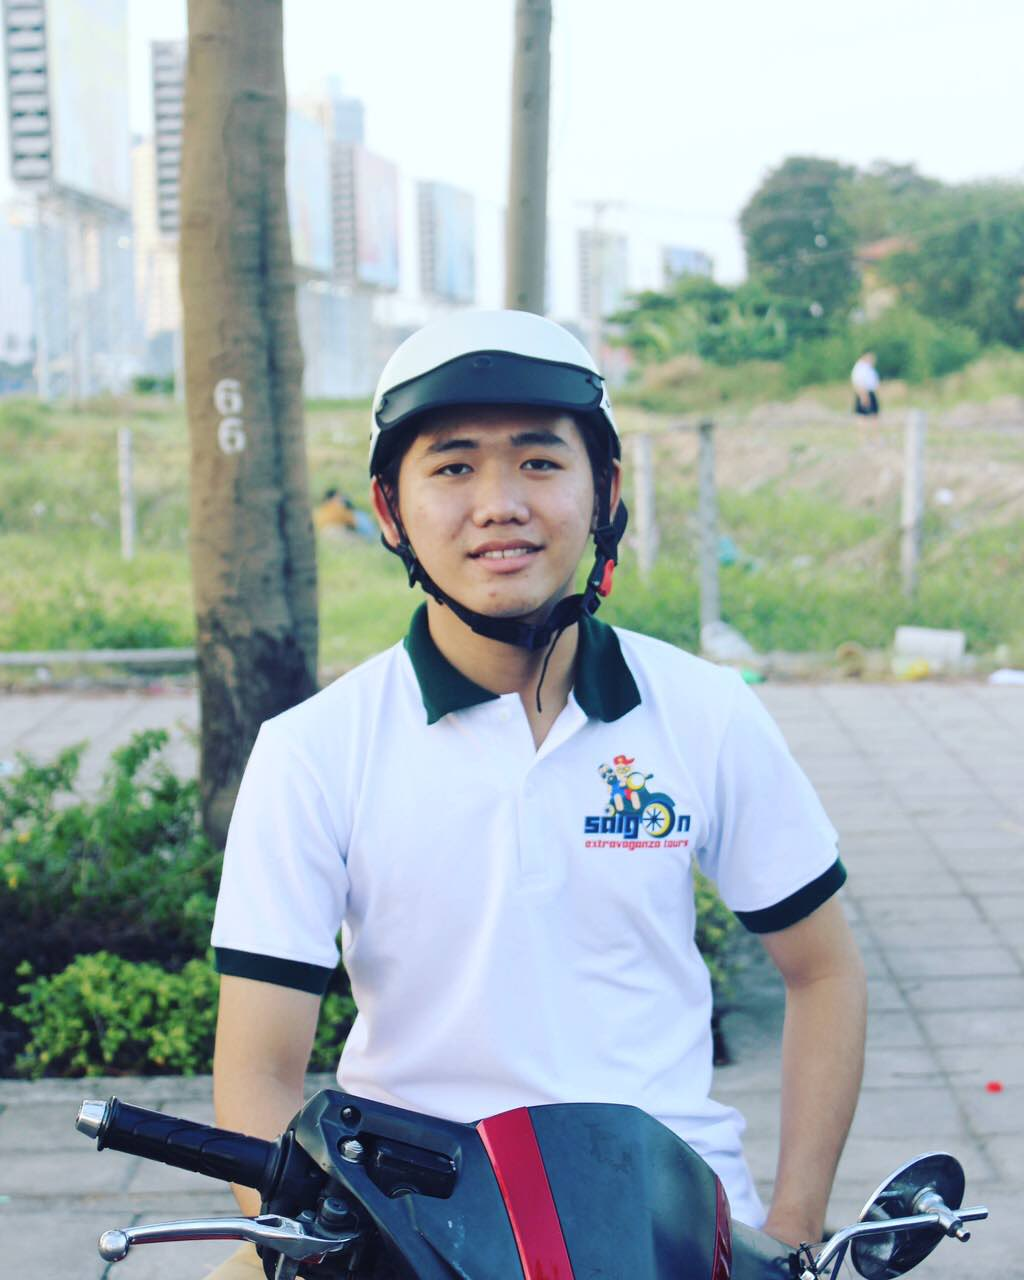 Tour Driver